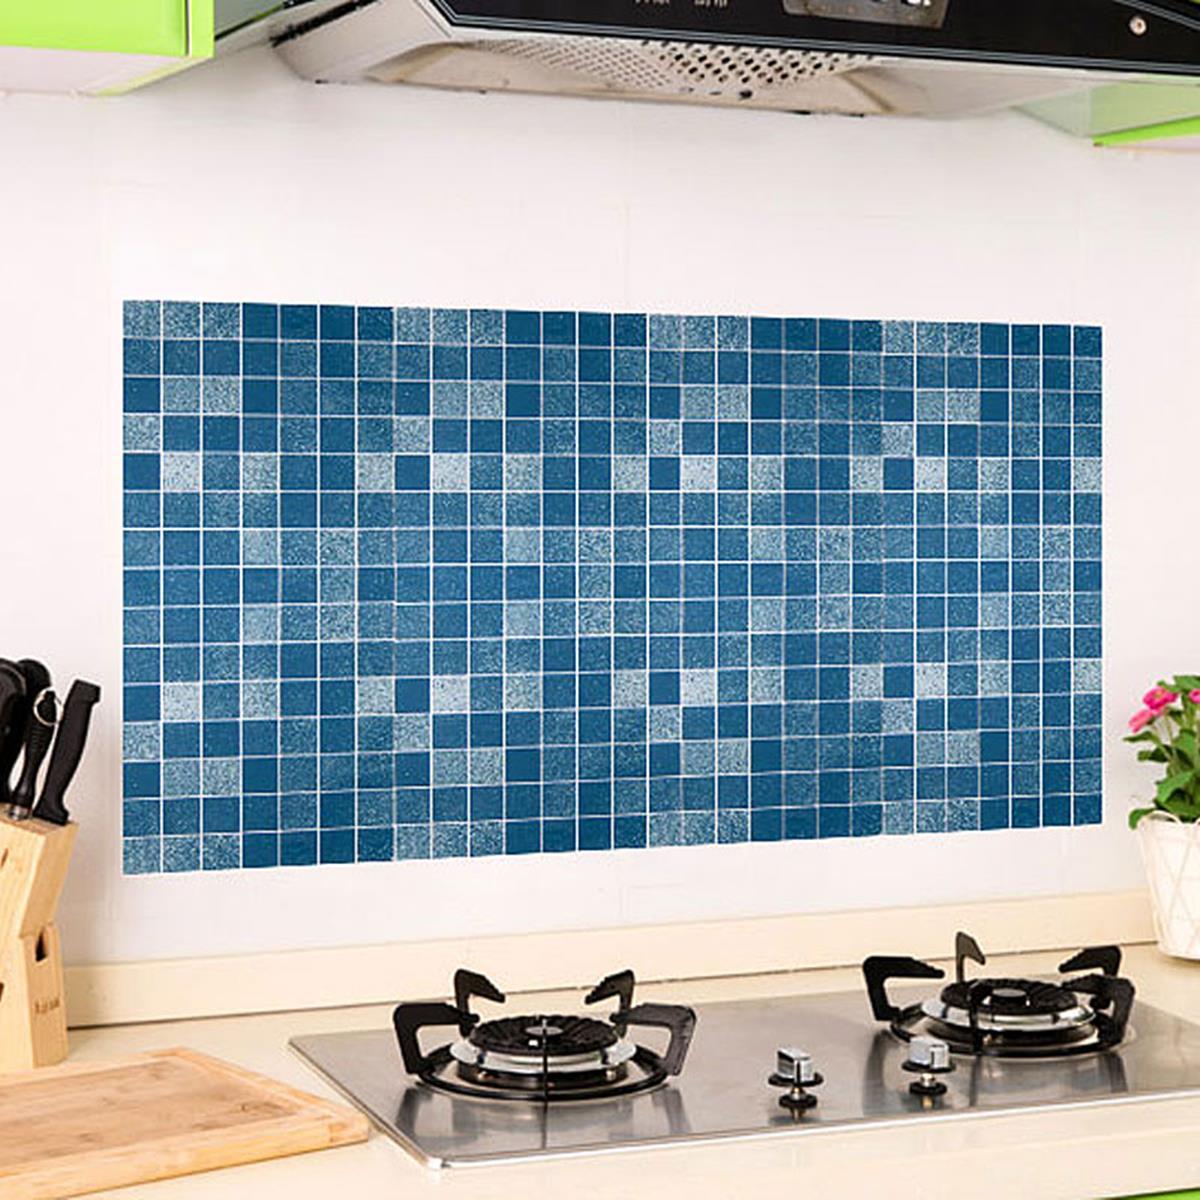 M osaic Wallpaper Aluminum Foil Wallpaper Adhesive Wall Sticker ...